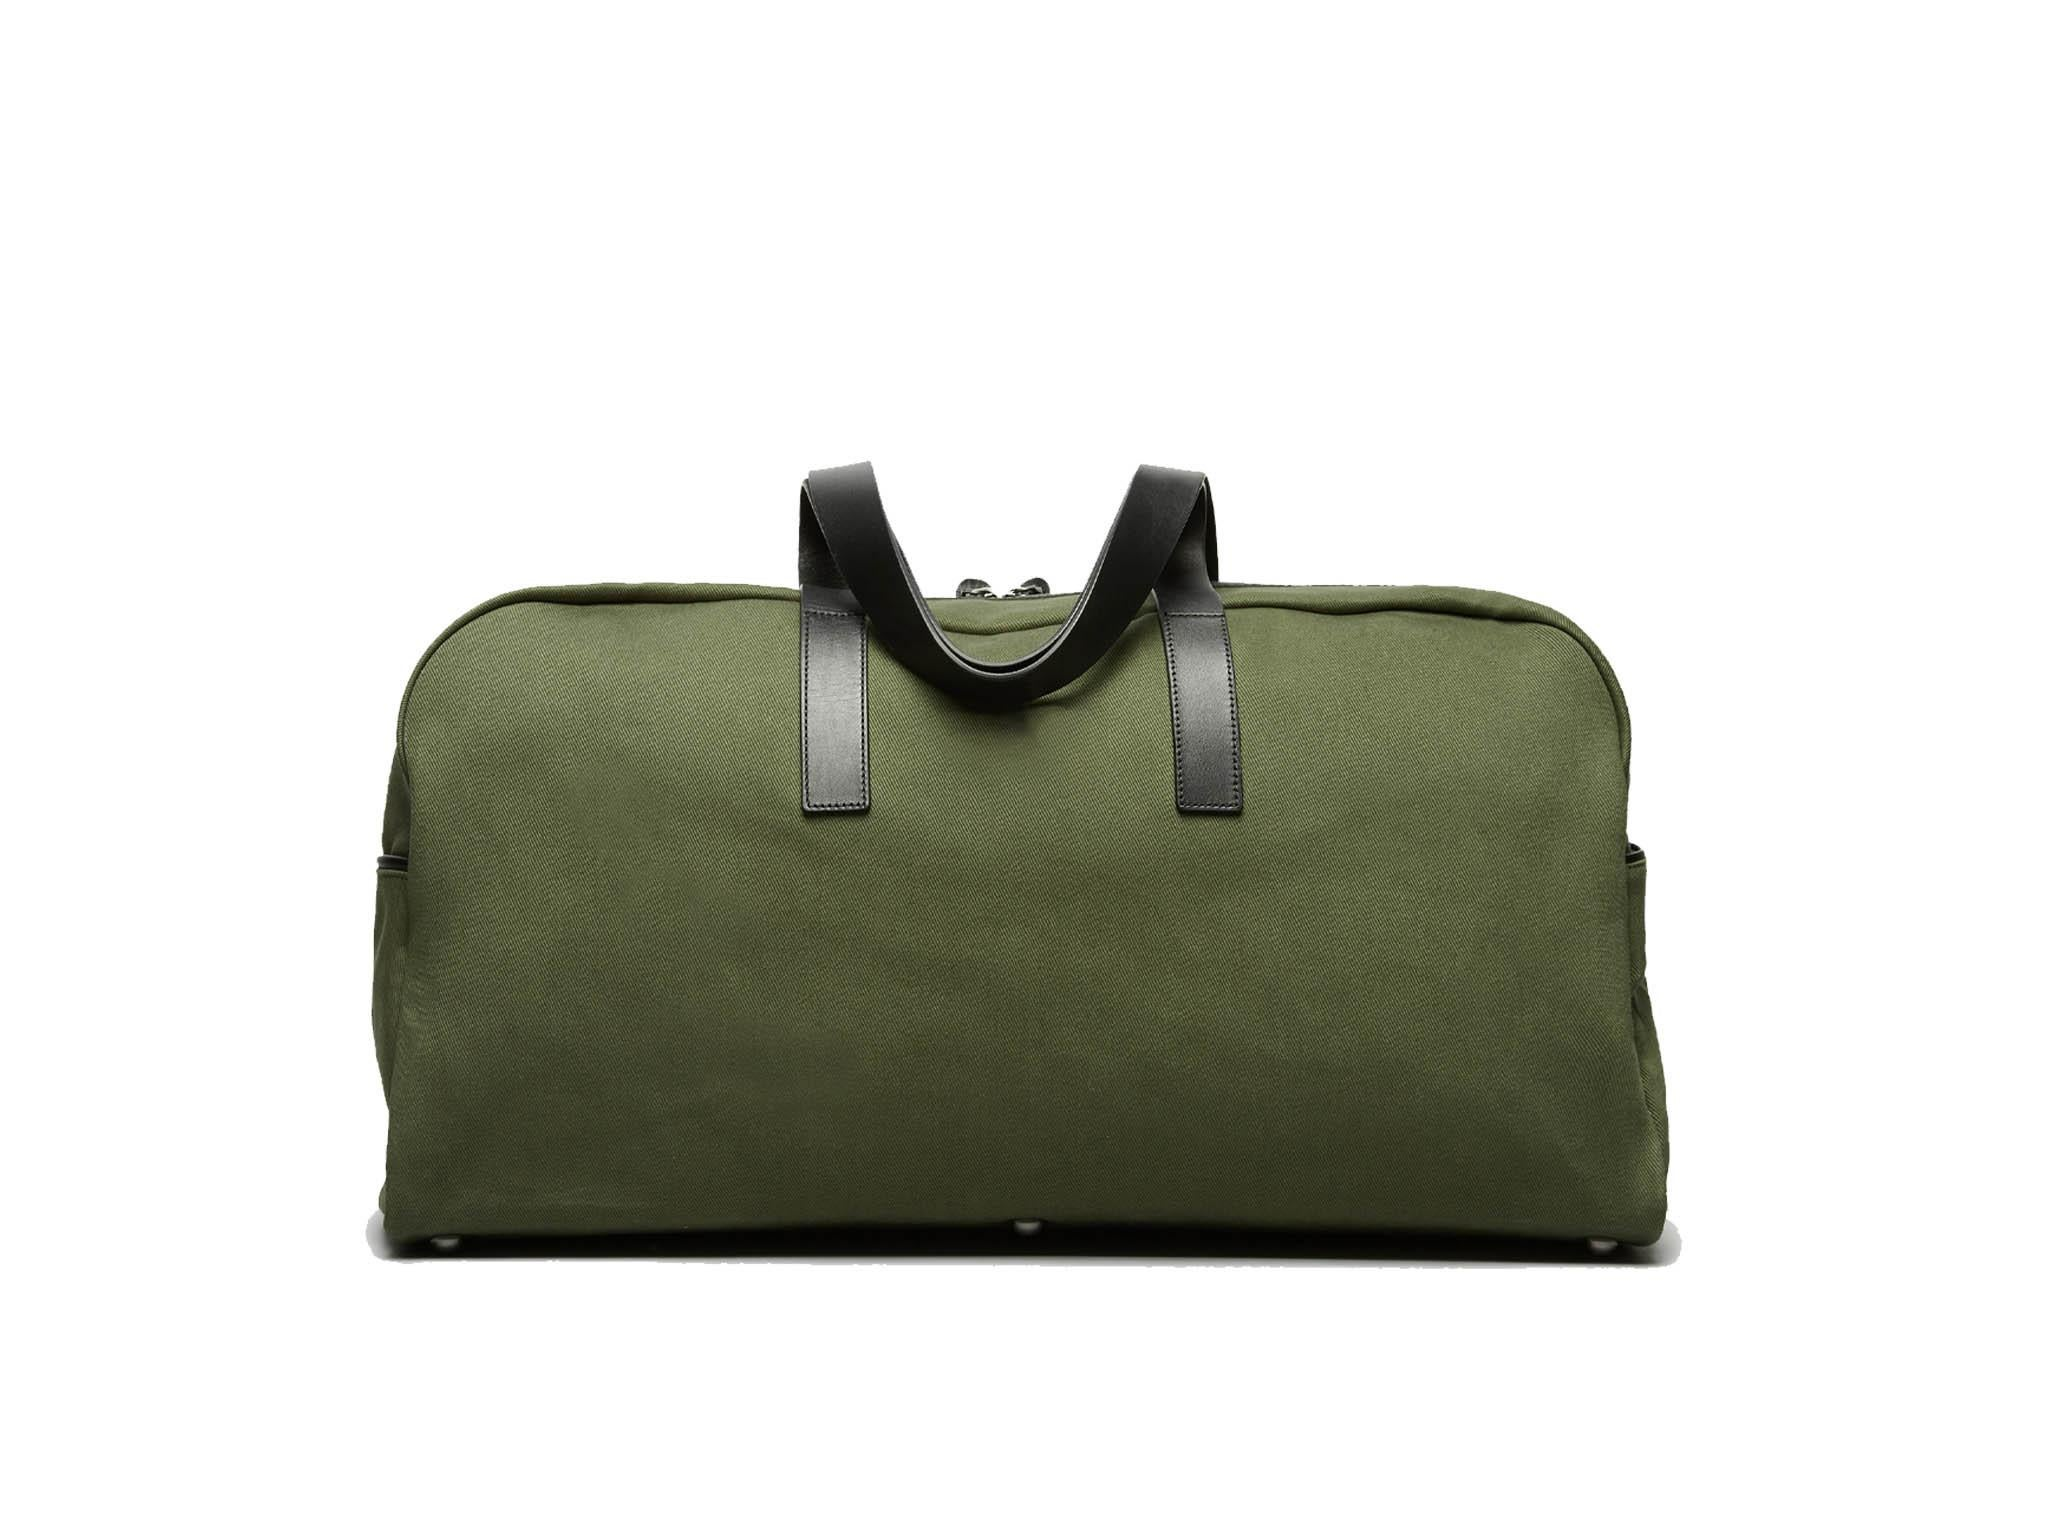 Travel Luggage Duffle Bag Lightweight Portable Handbag Animals Elephants Print Large Capacity Waterproof Foldable Storage Tote